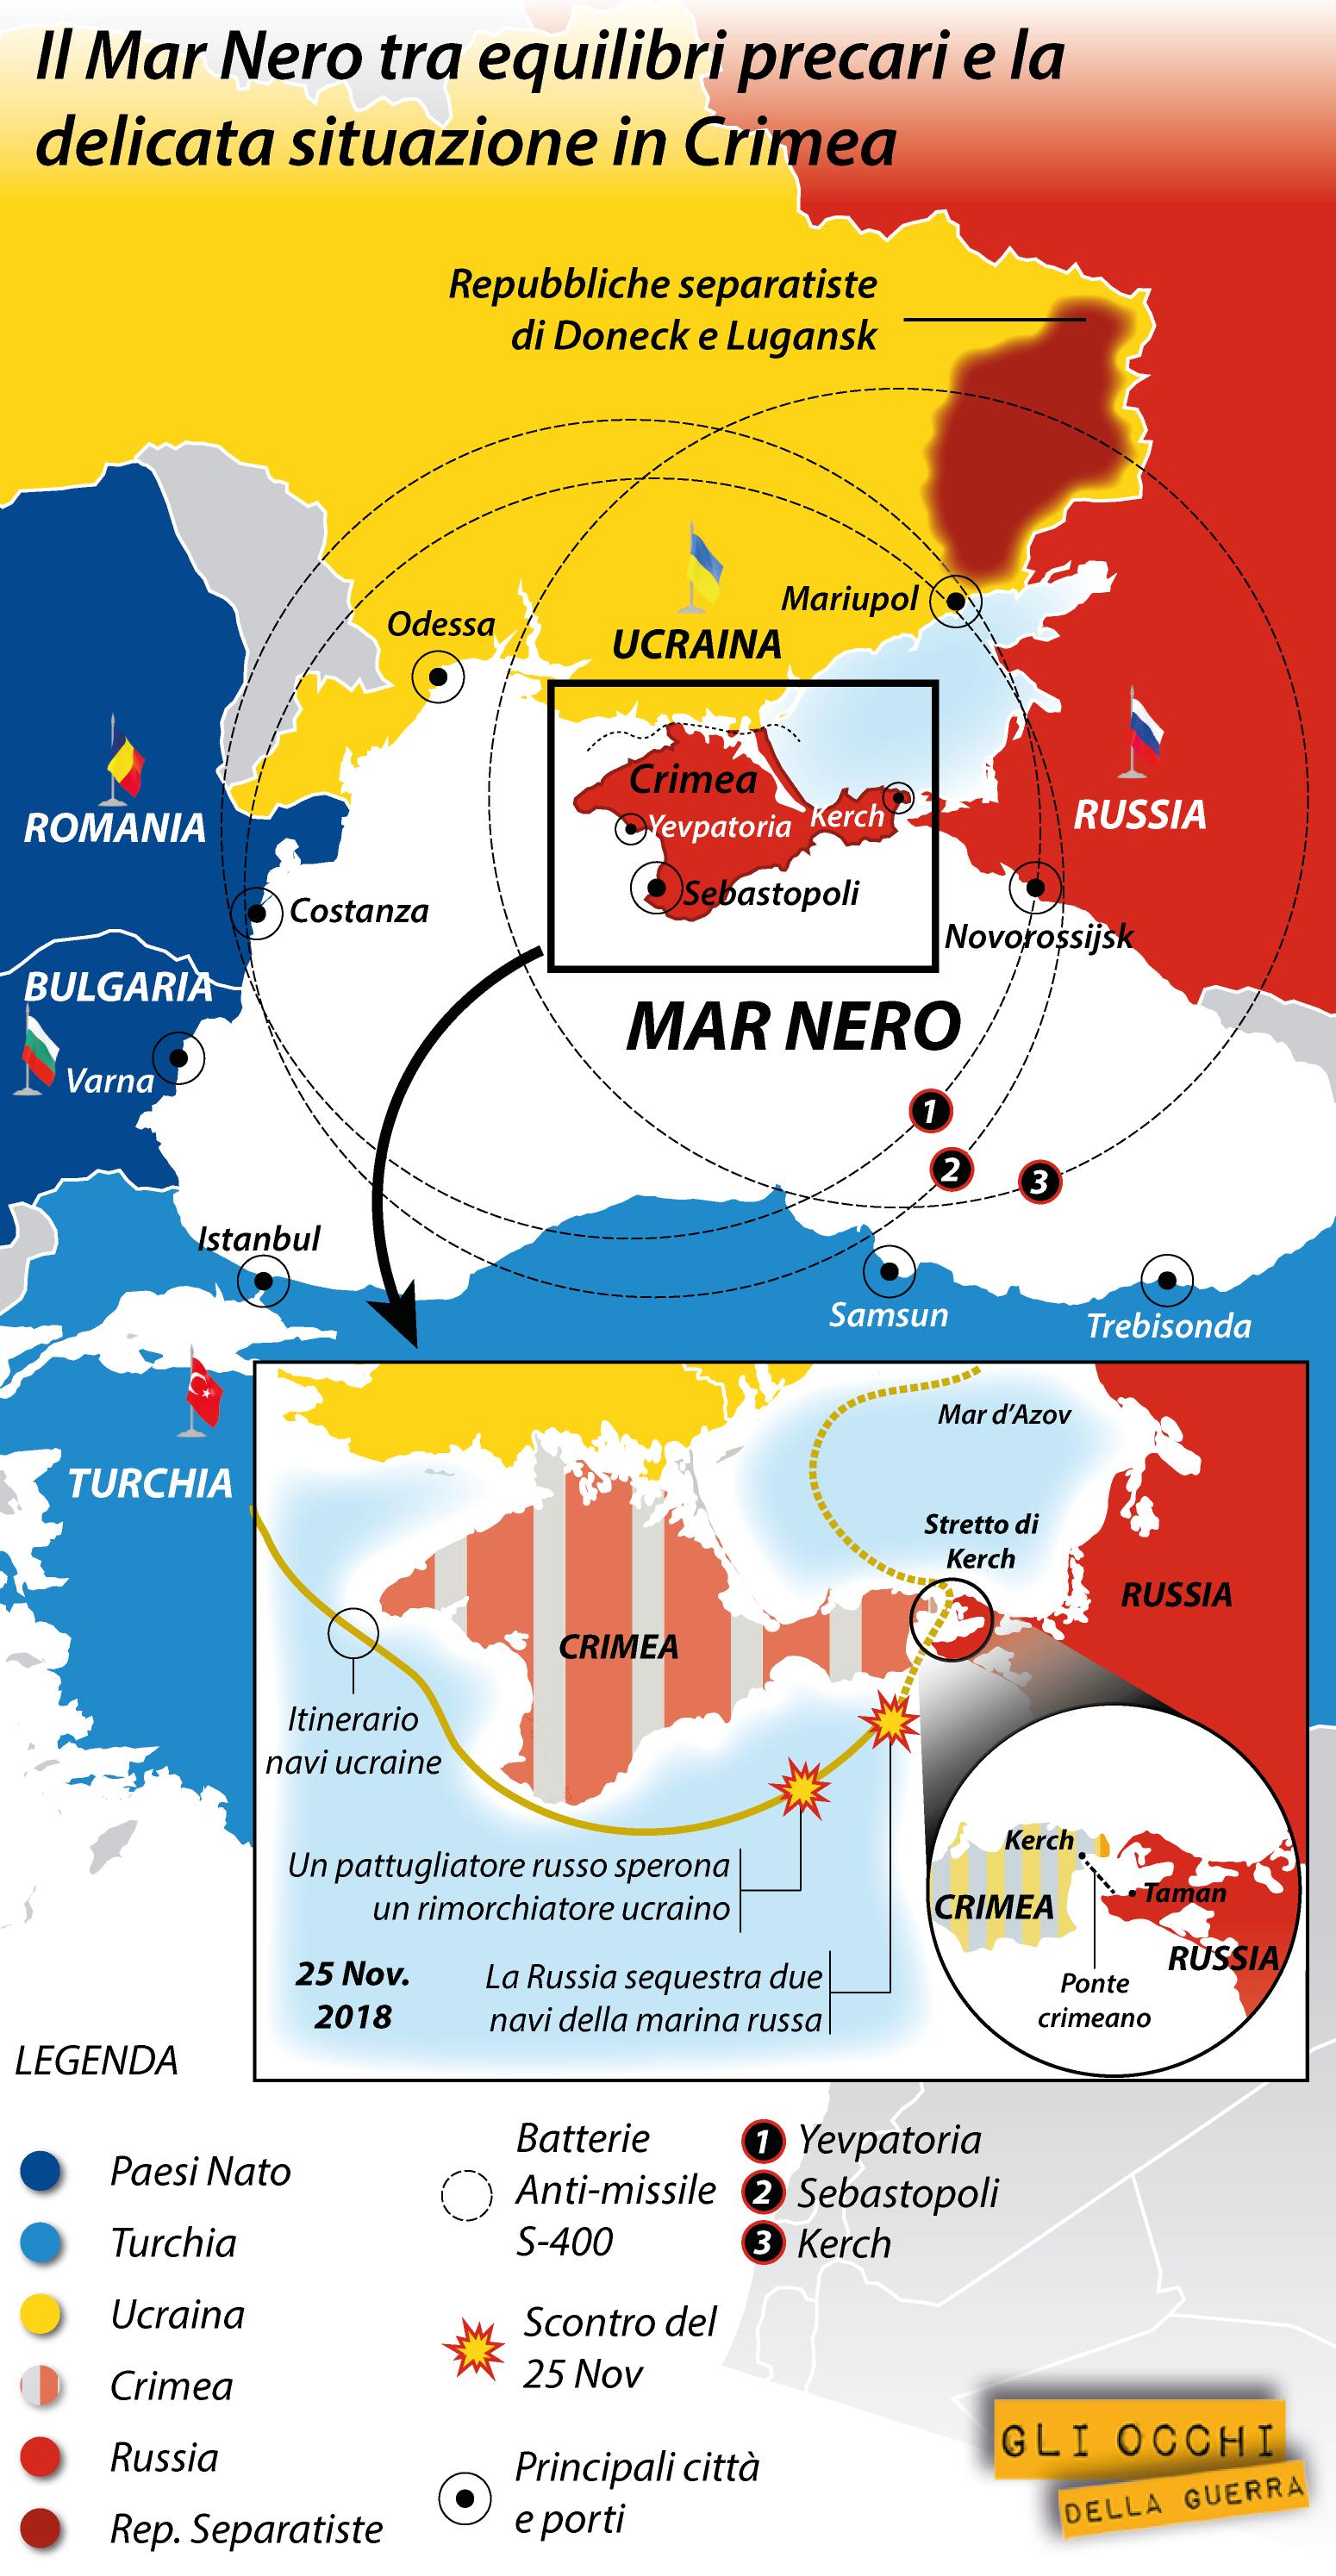 mar nero situazione ucraina russia 2